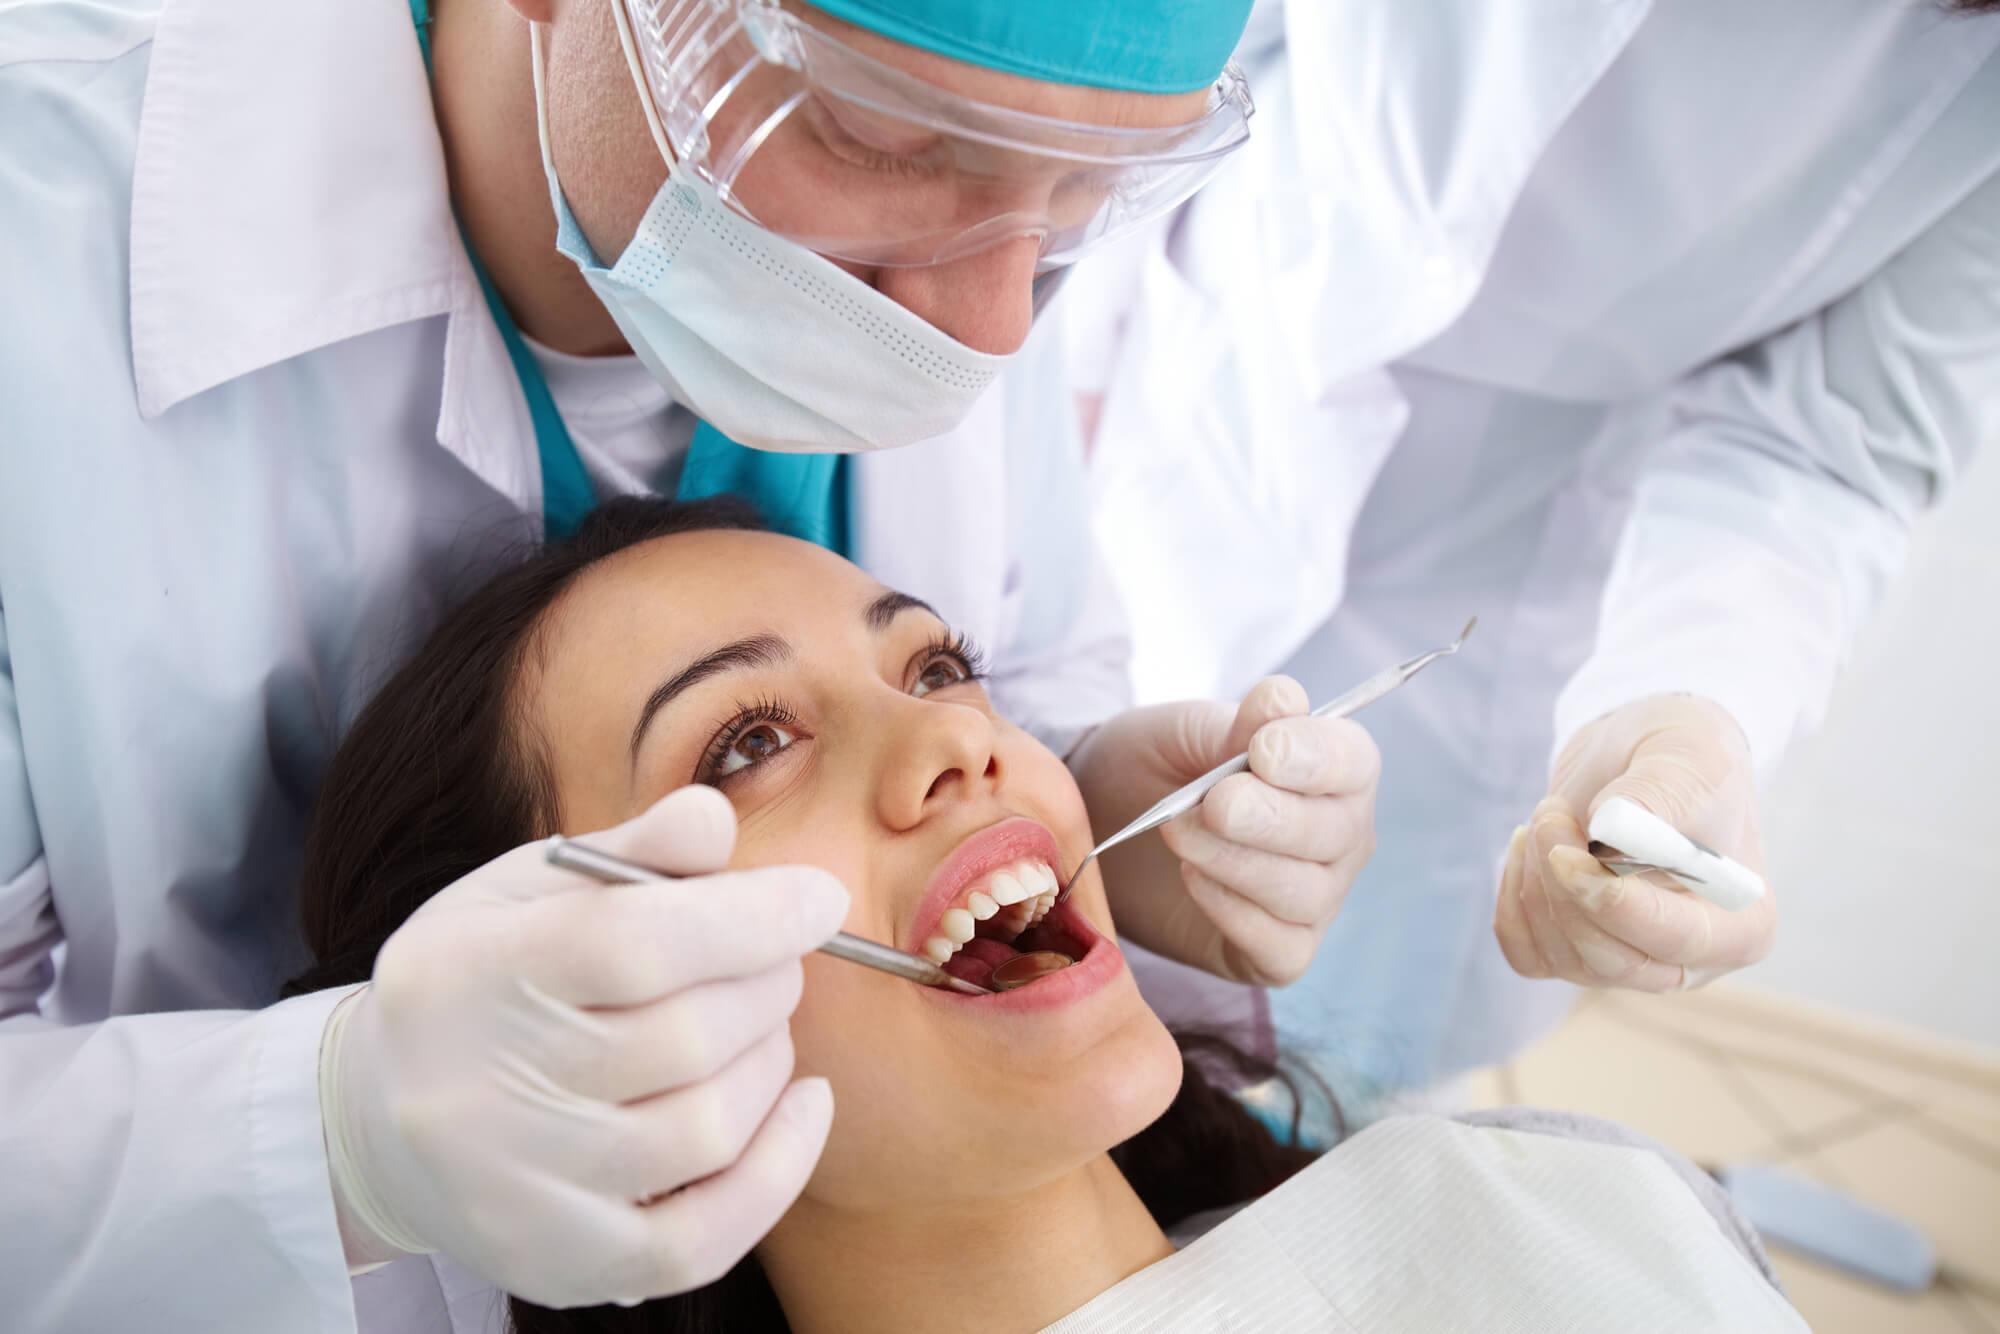 who offers a dentist boynton beach?